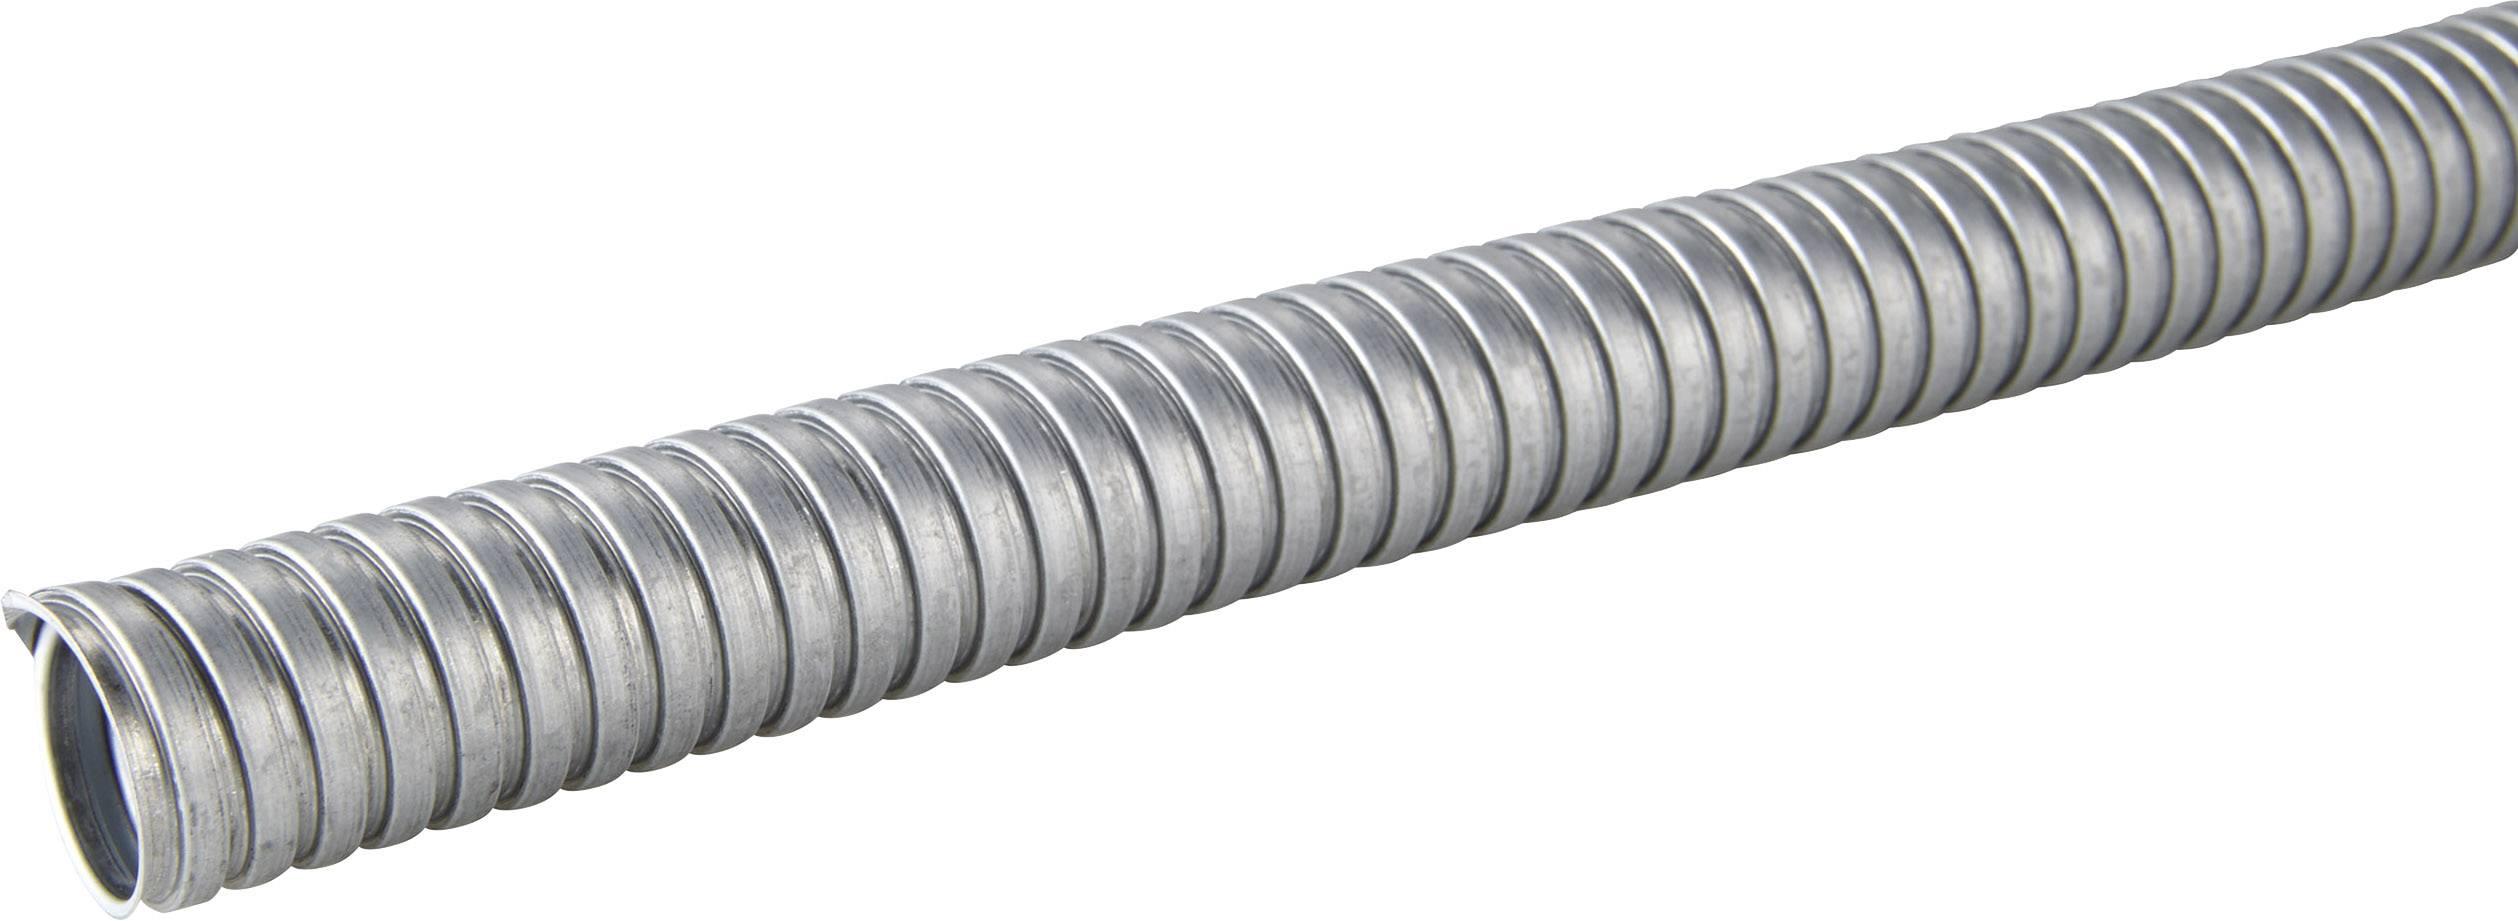 Ochranná hadice na kov LAPP SILVYN® AS 48/51x56 61802170, stříbrná, 25 m